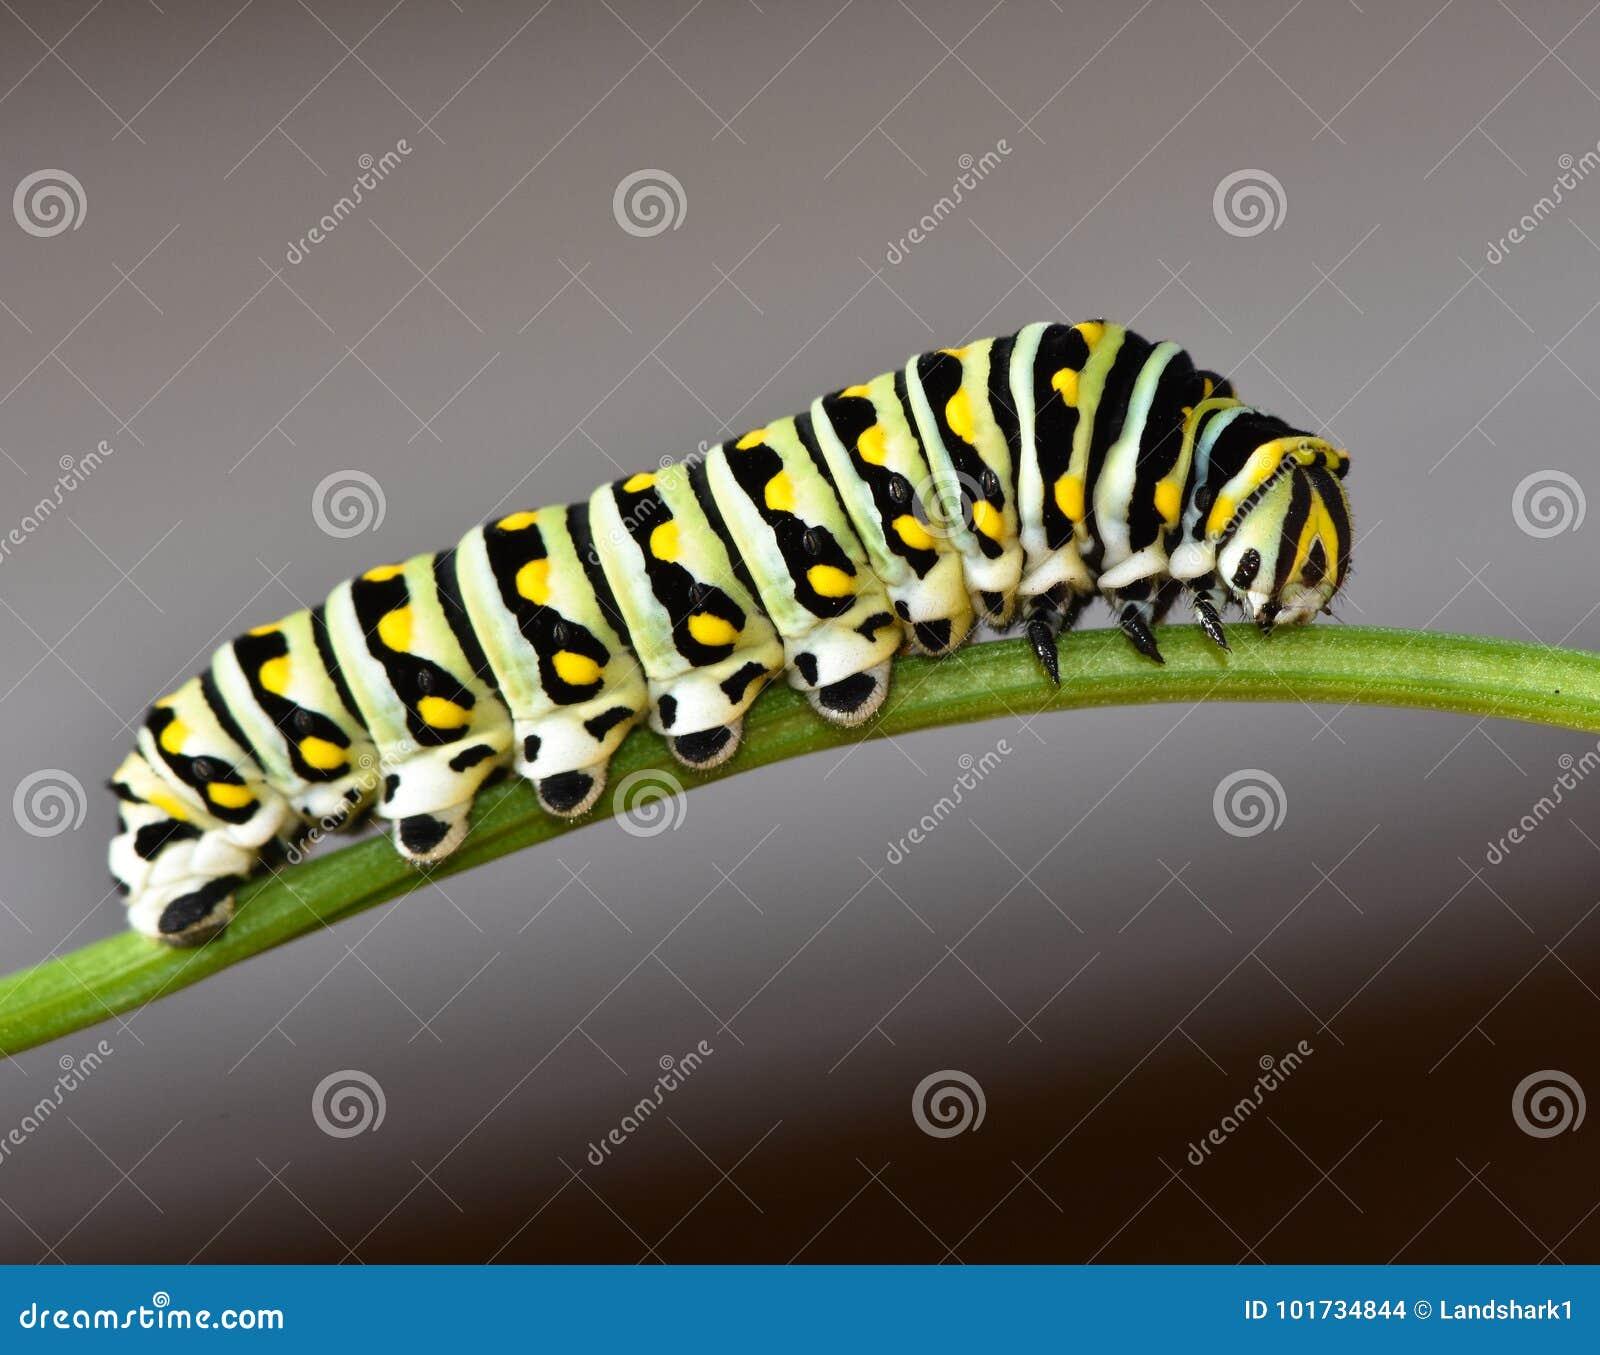 Black Swallowtail Caterpillar - Butterfly larva